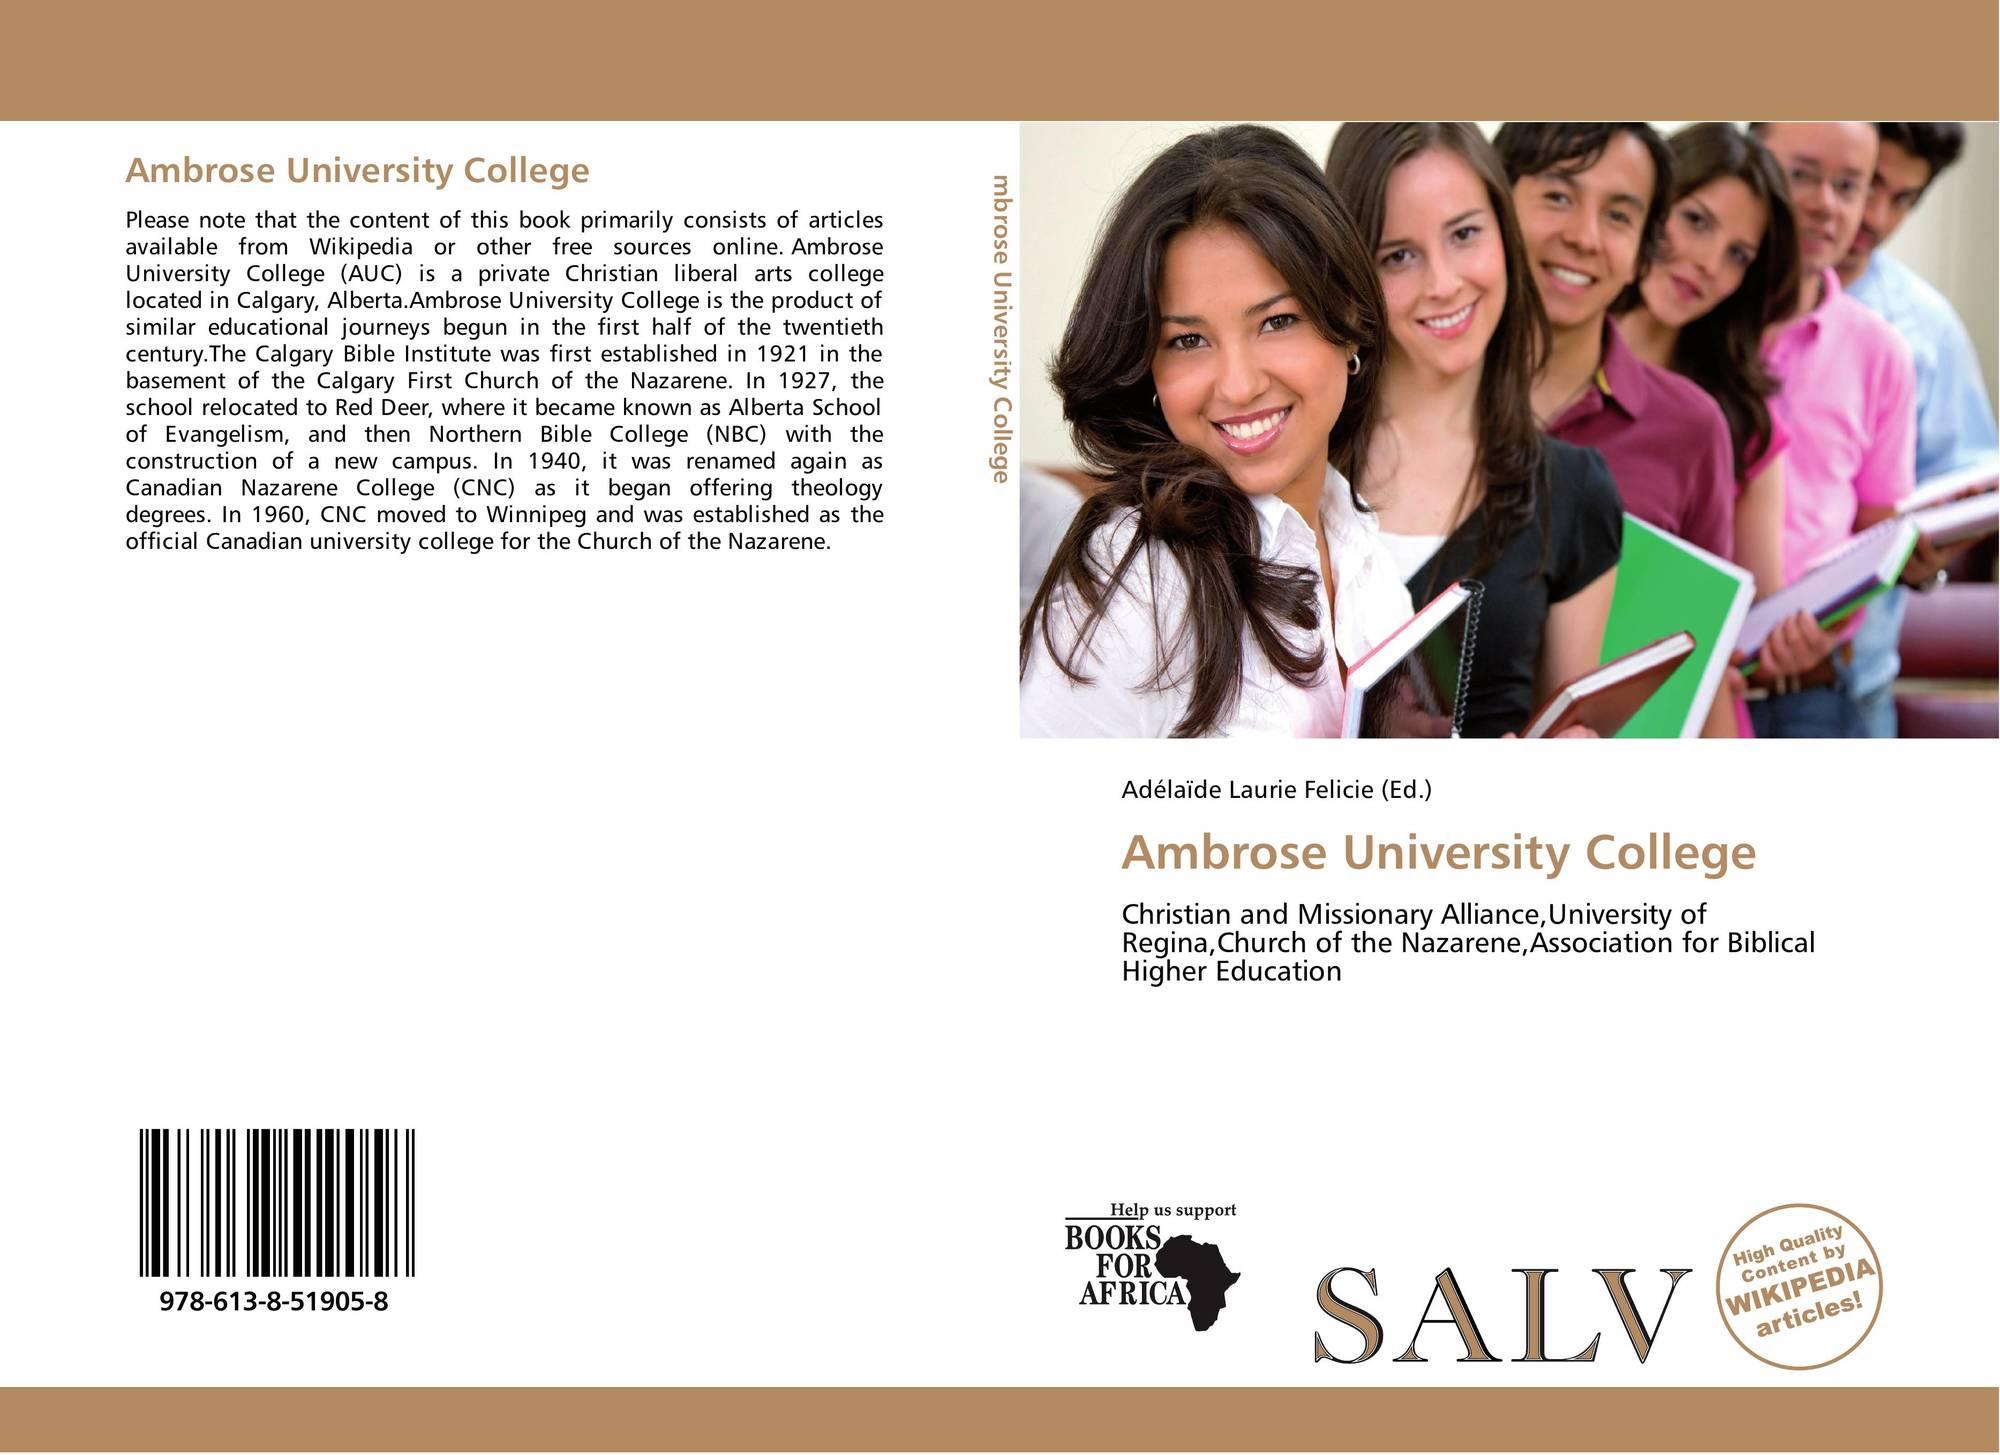 Ambrose University College, 978-613-8-51905-8, 6138519051